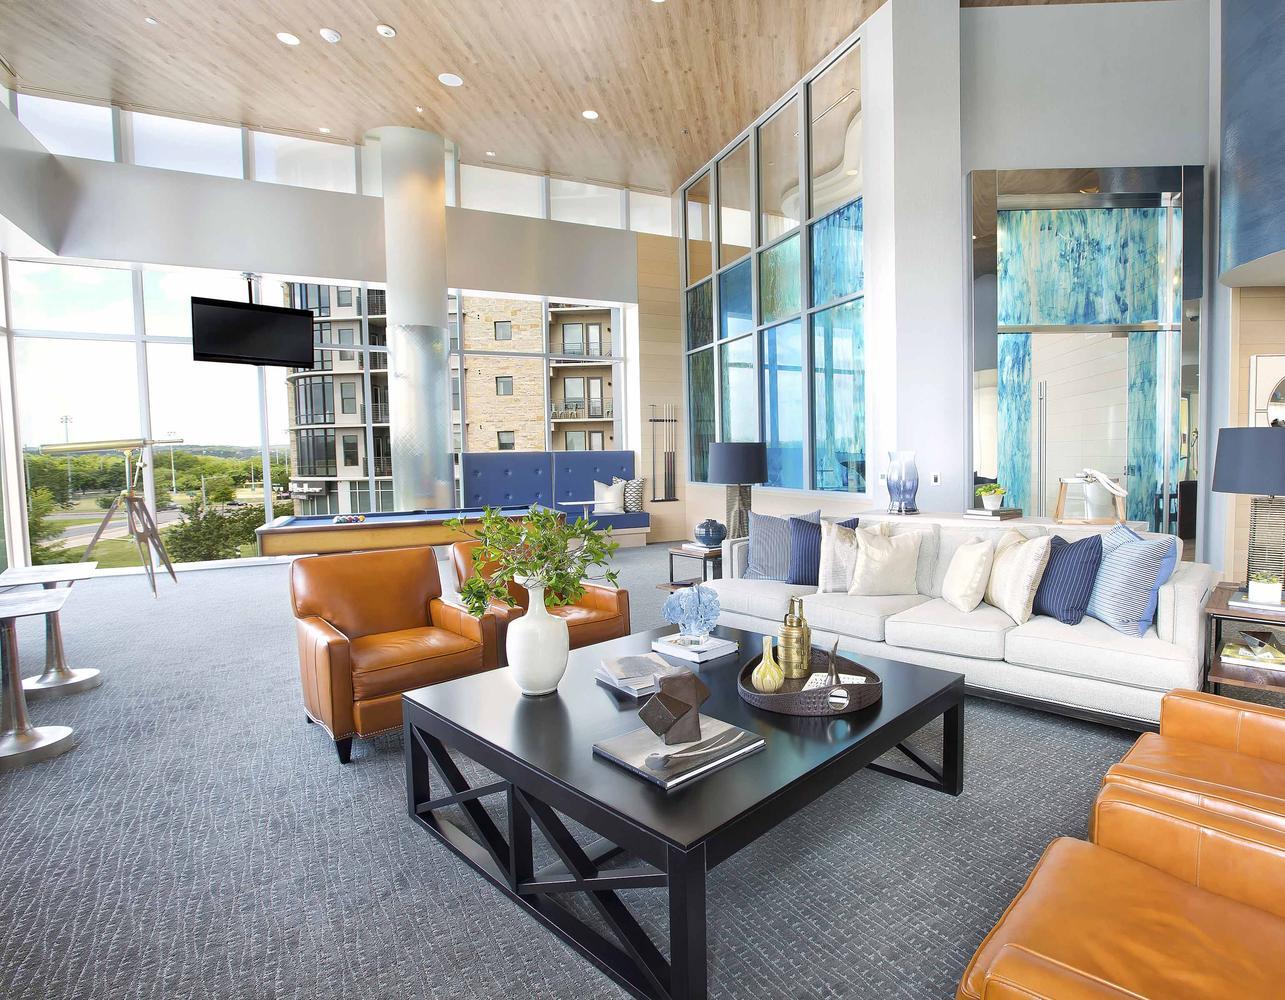 Gables Park Tower | Gables Residential Communities on